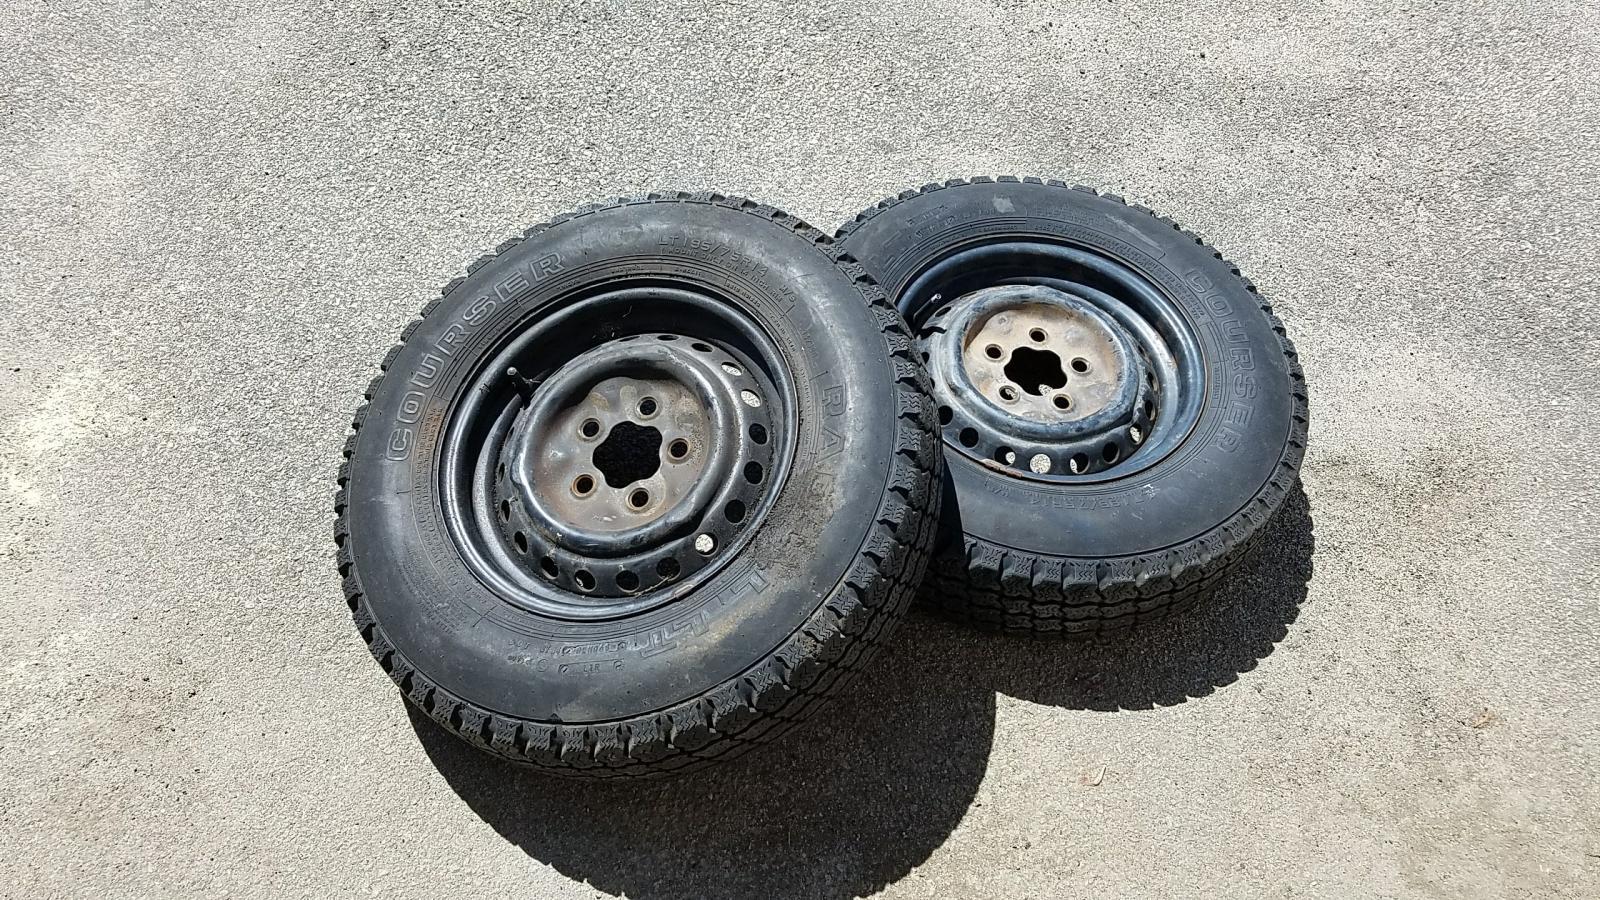 TYTBN tires